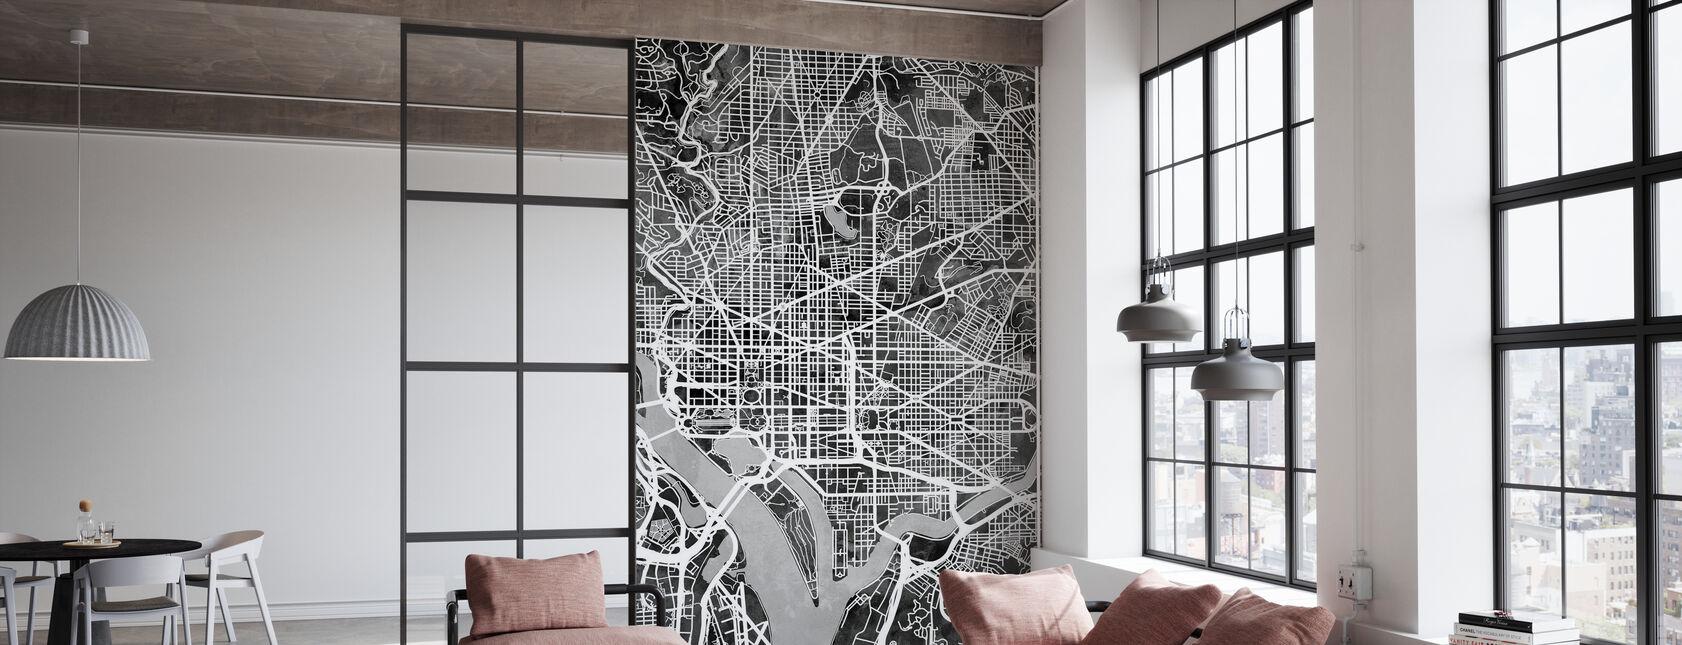 Washington DC Street Kaart - Behang - Kantoor